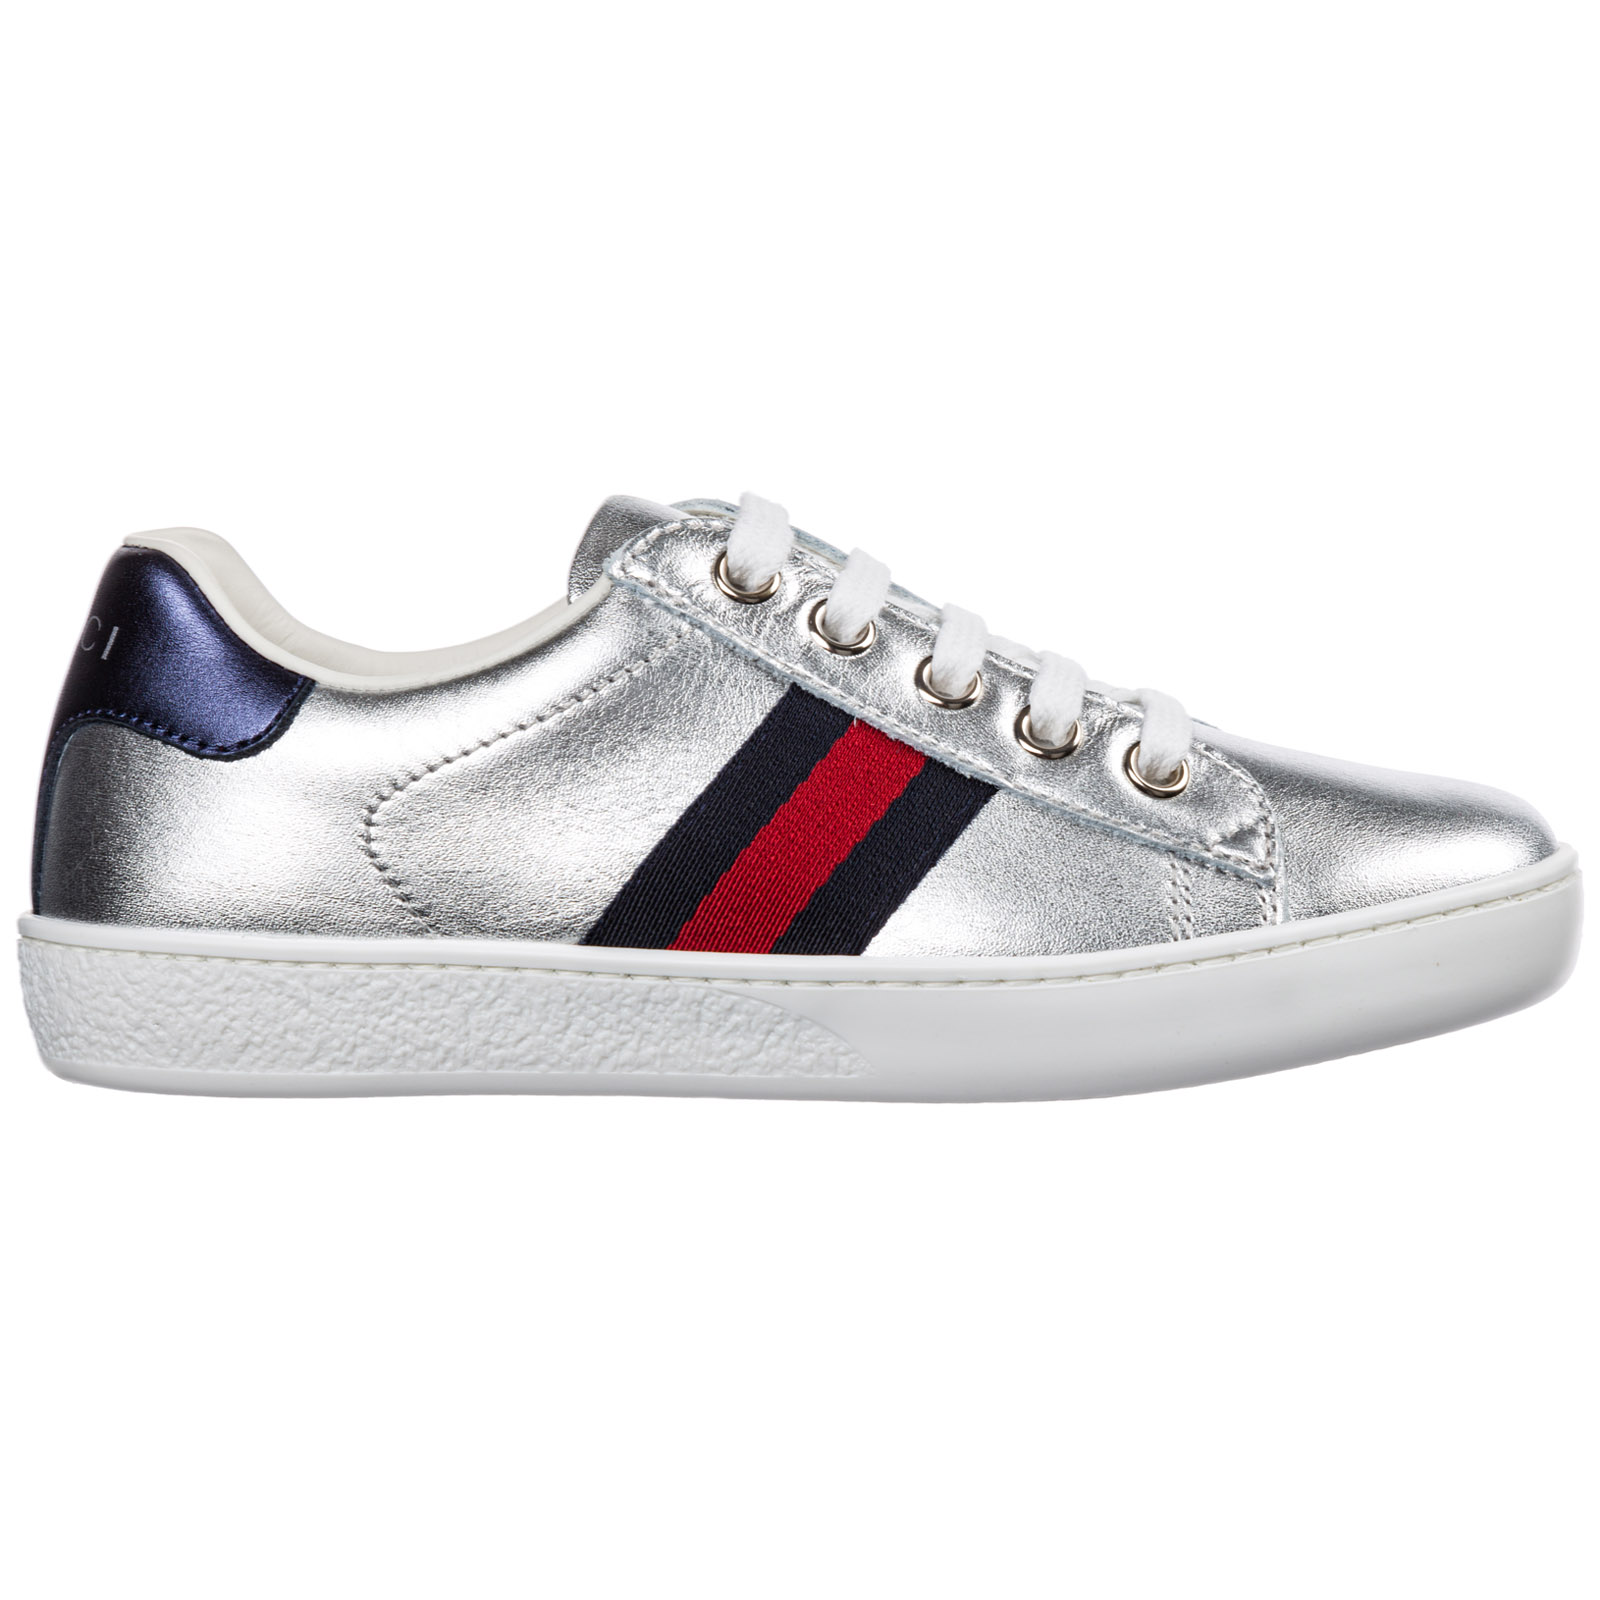 c60457a45 Sneakers Gucci Ace 433148 BMPW0 8171 argento | FRMODA.com